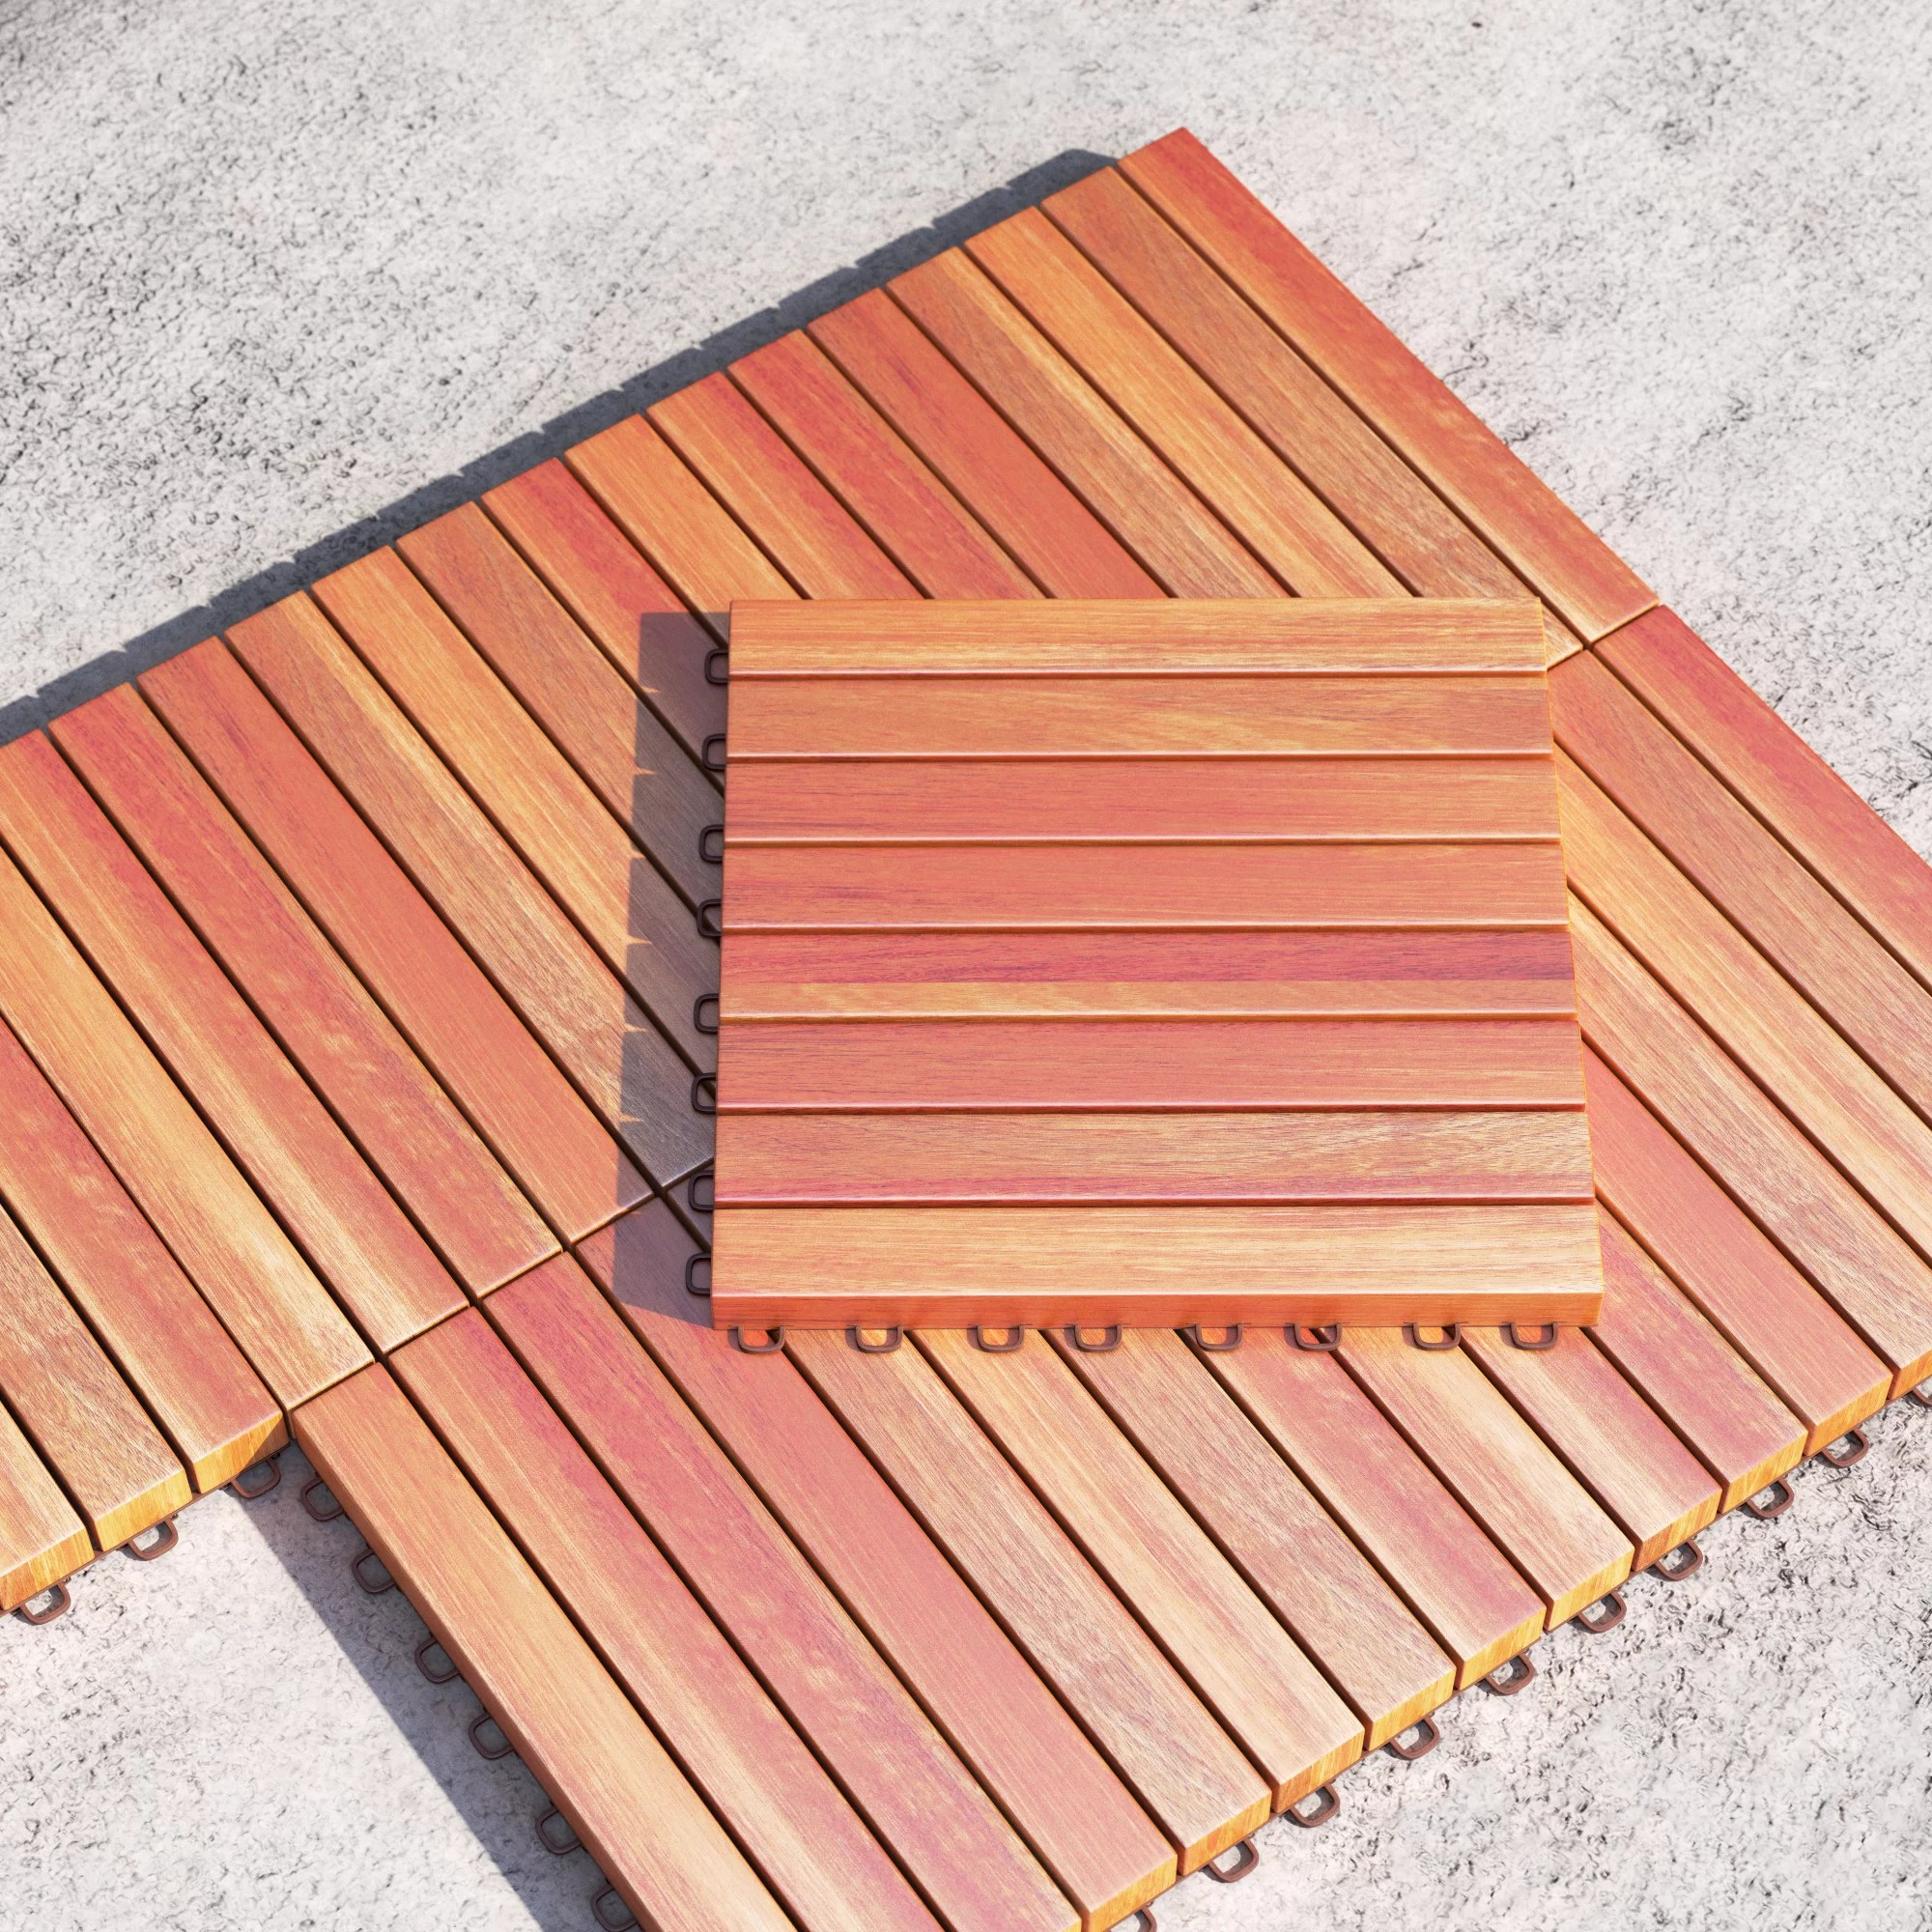 11 x 11 wood interlocking deck tile in tan